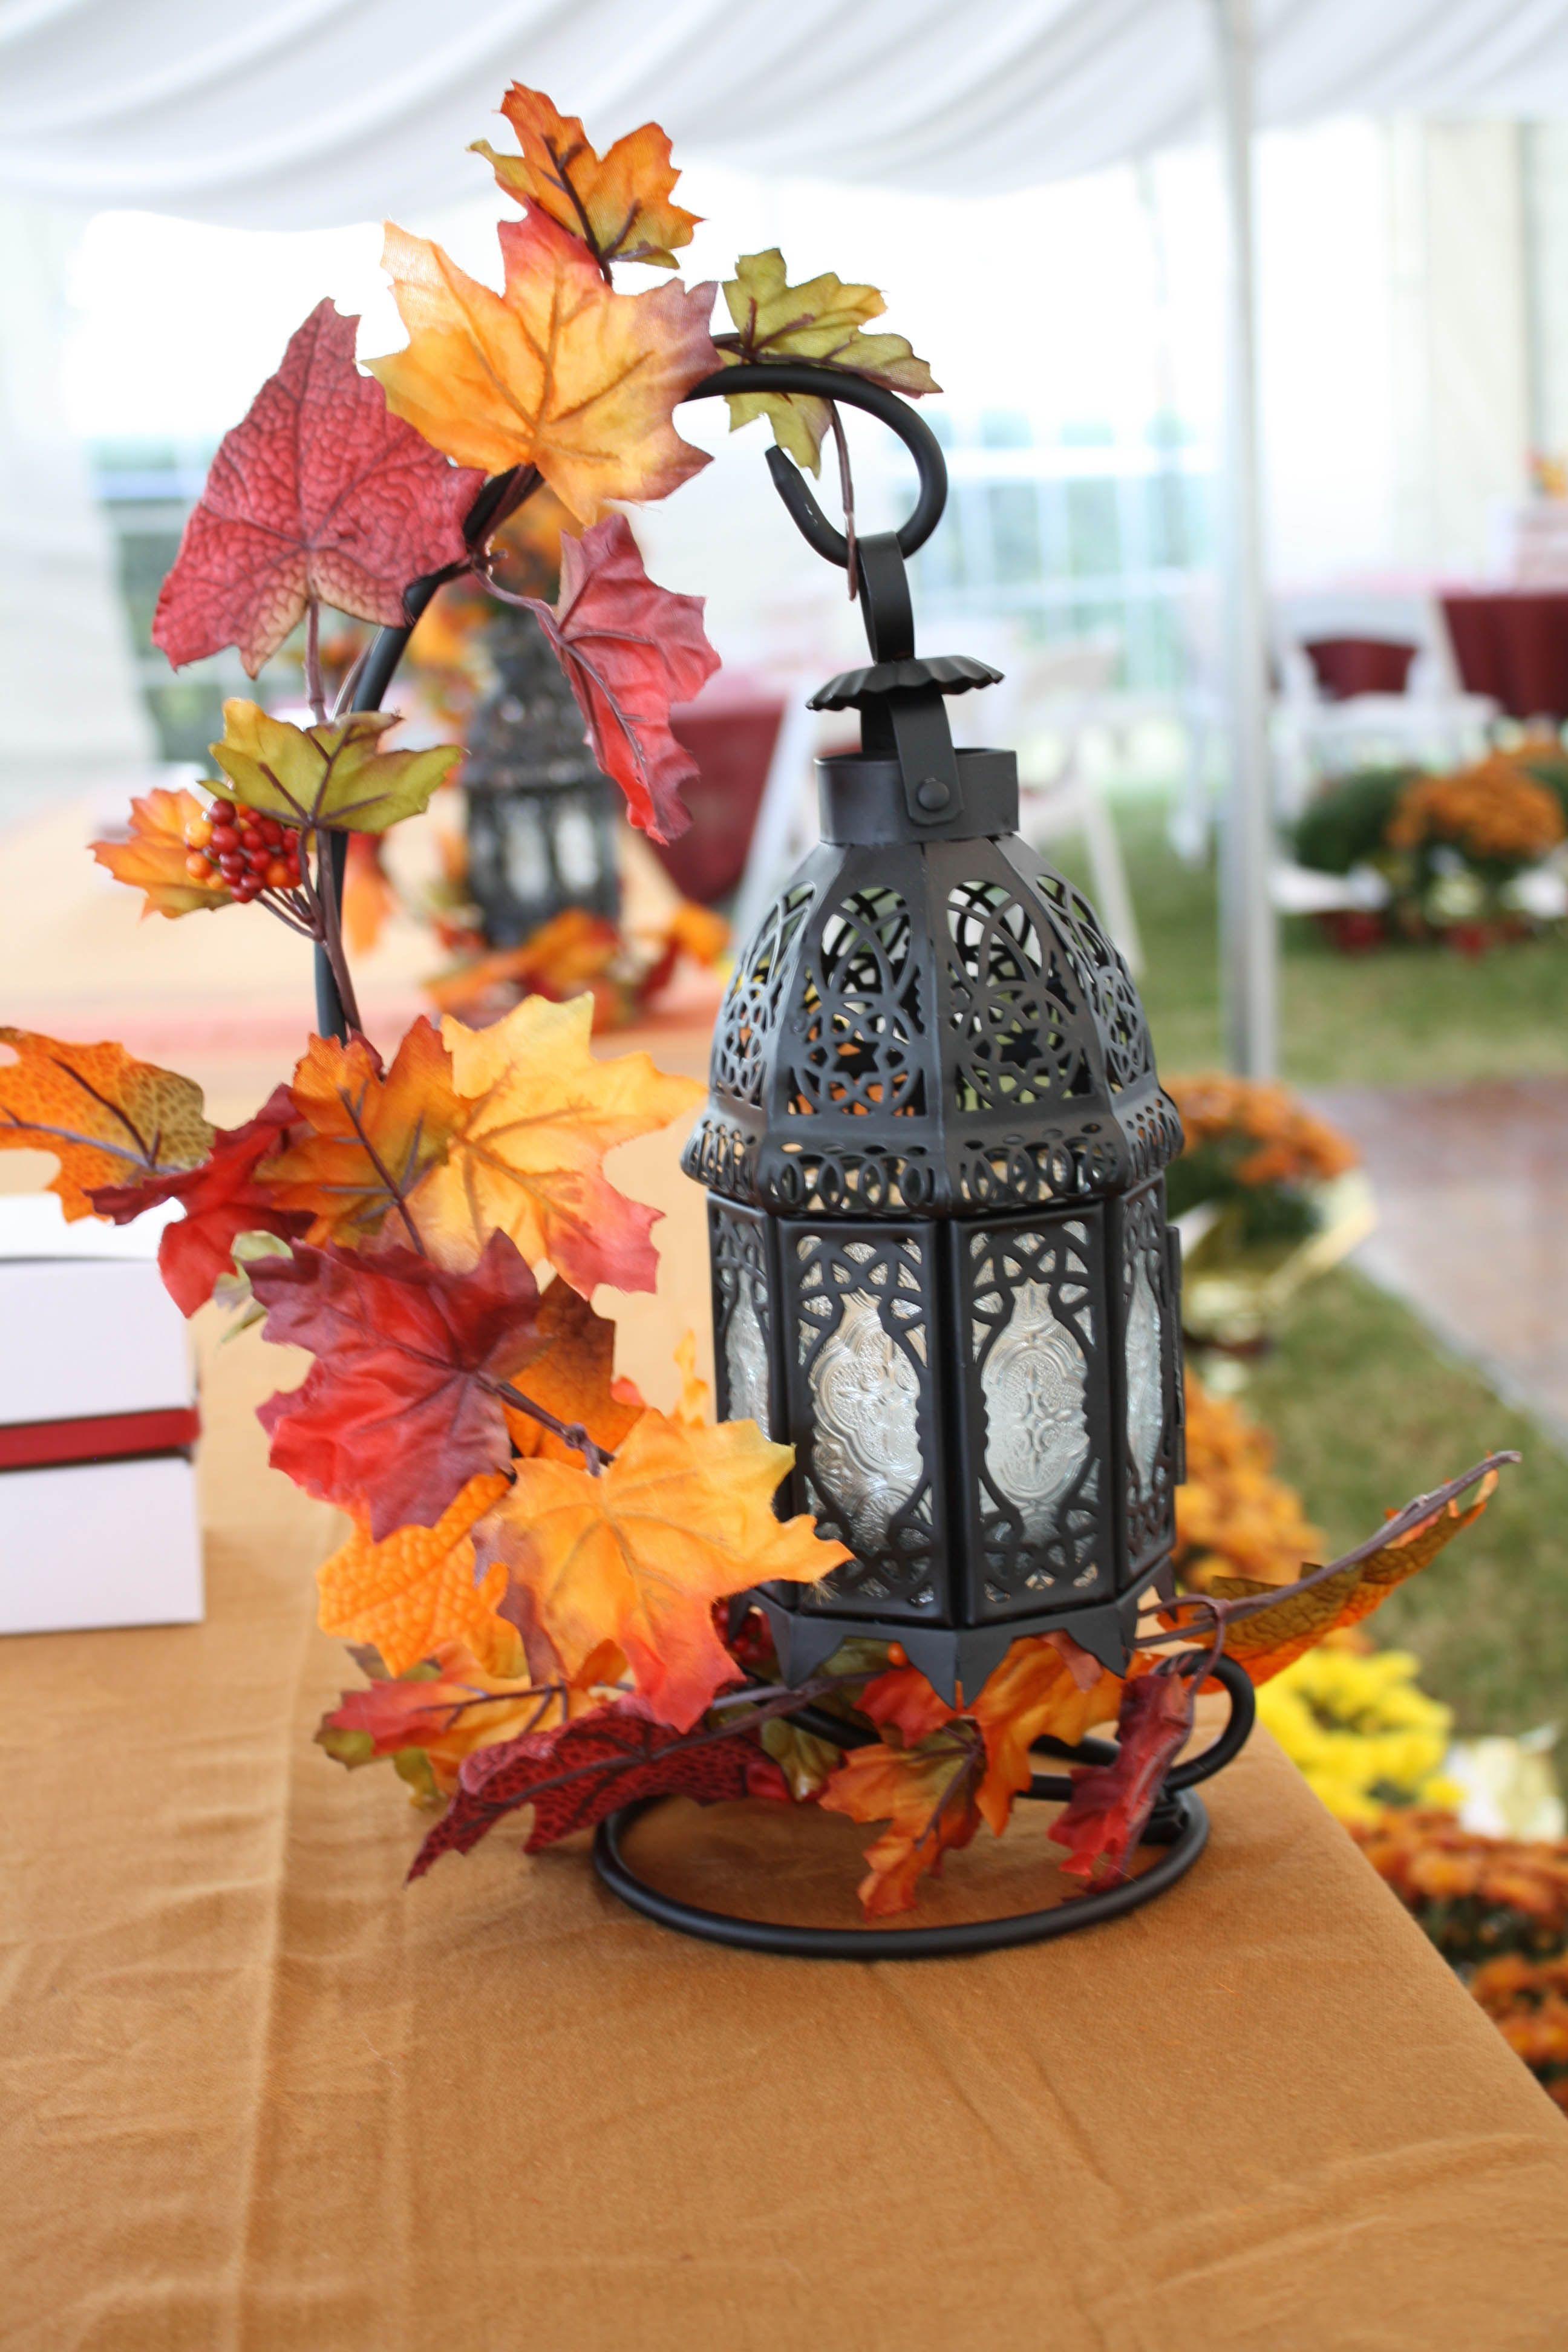 Trishas Centerpiece for October Wedding Creative Ideas - October Decorations